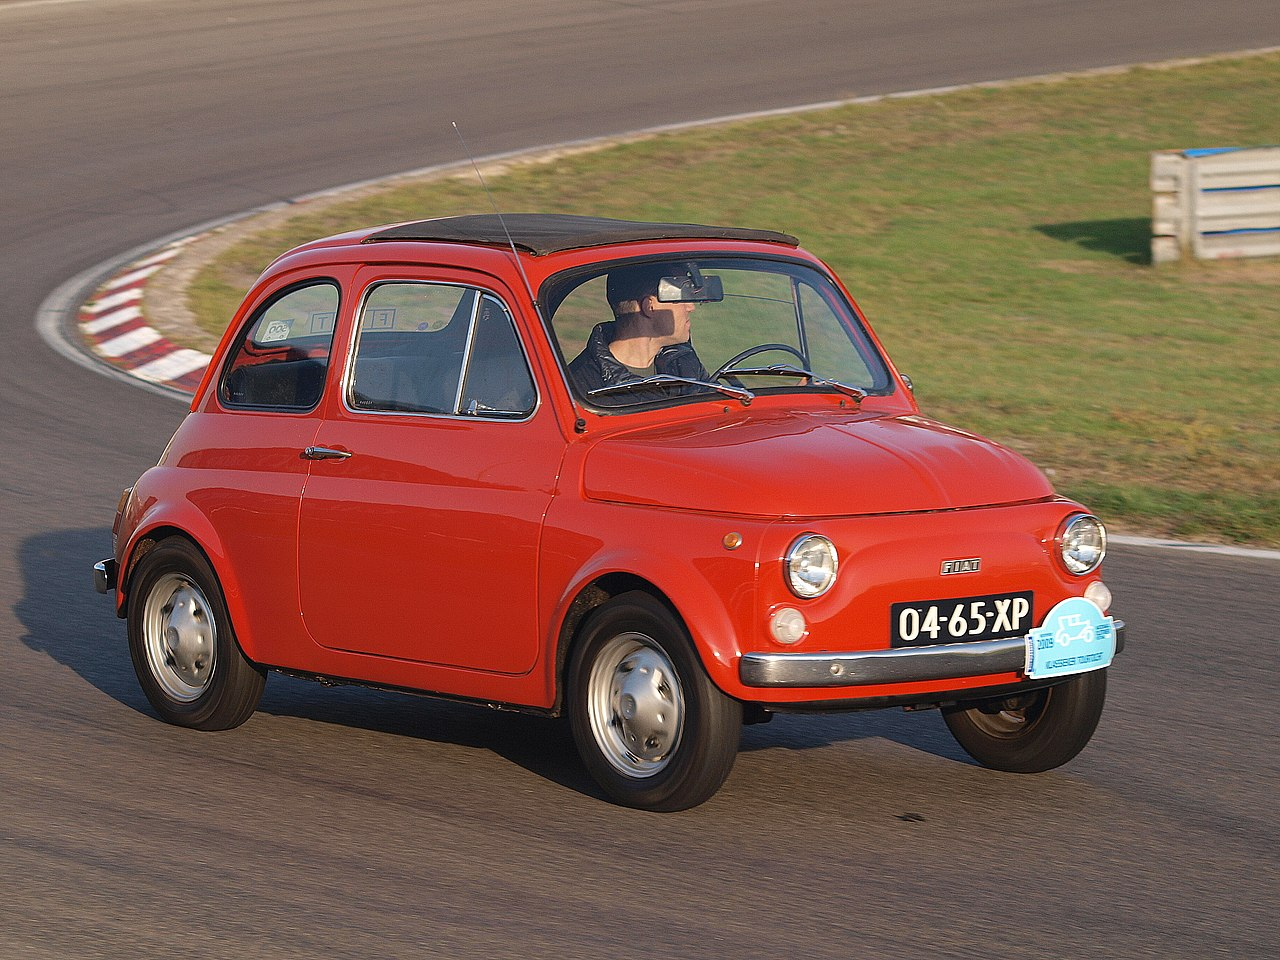 1280px-Fiat_500R_dutch_licence_registrat